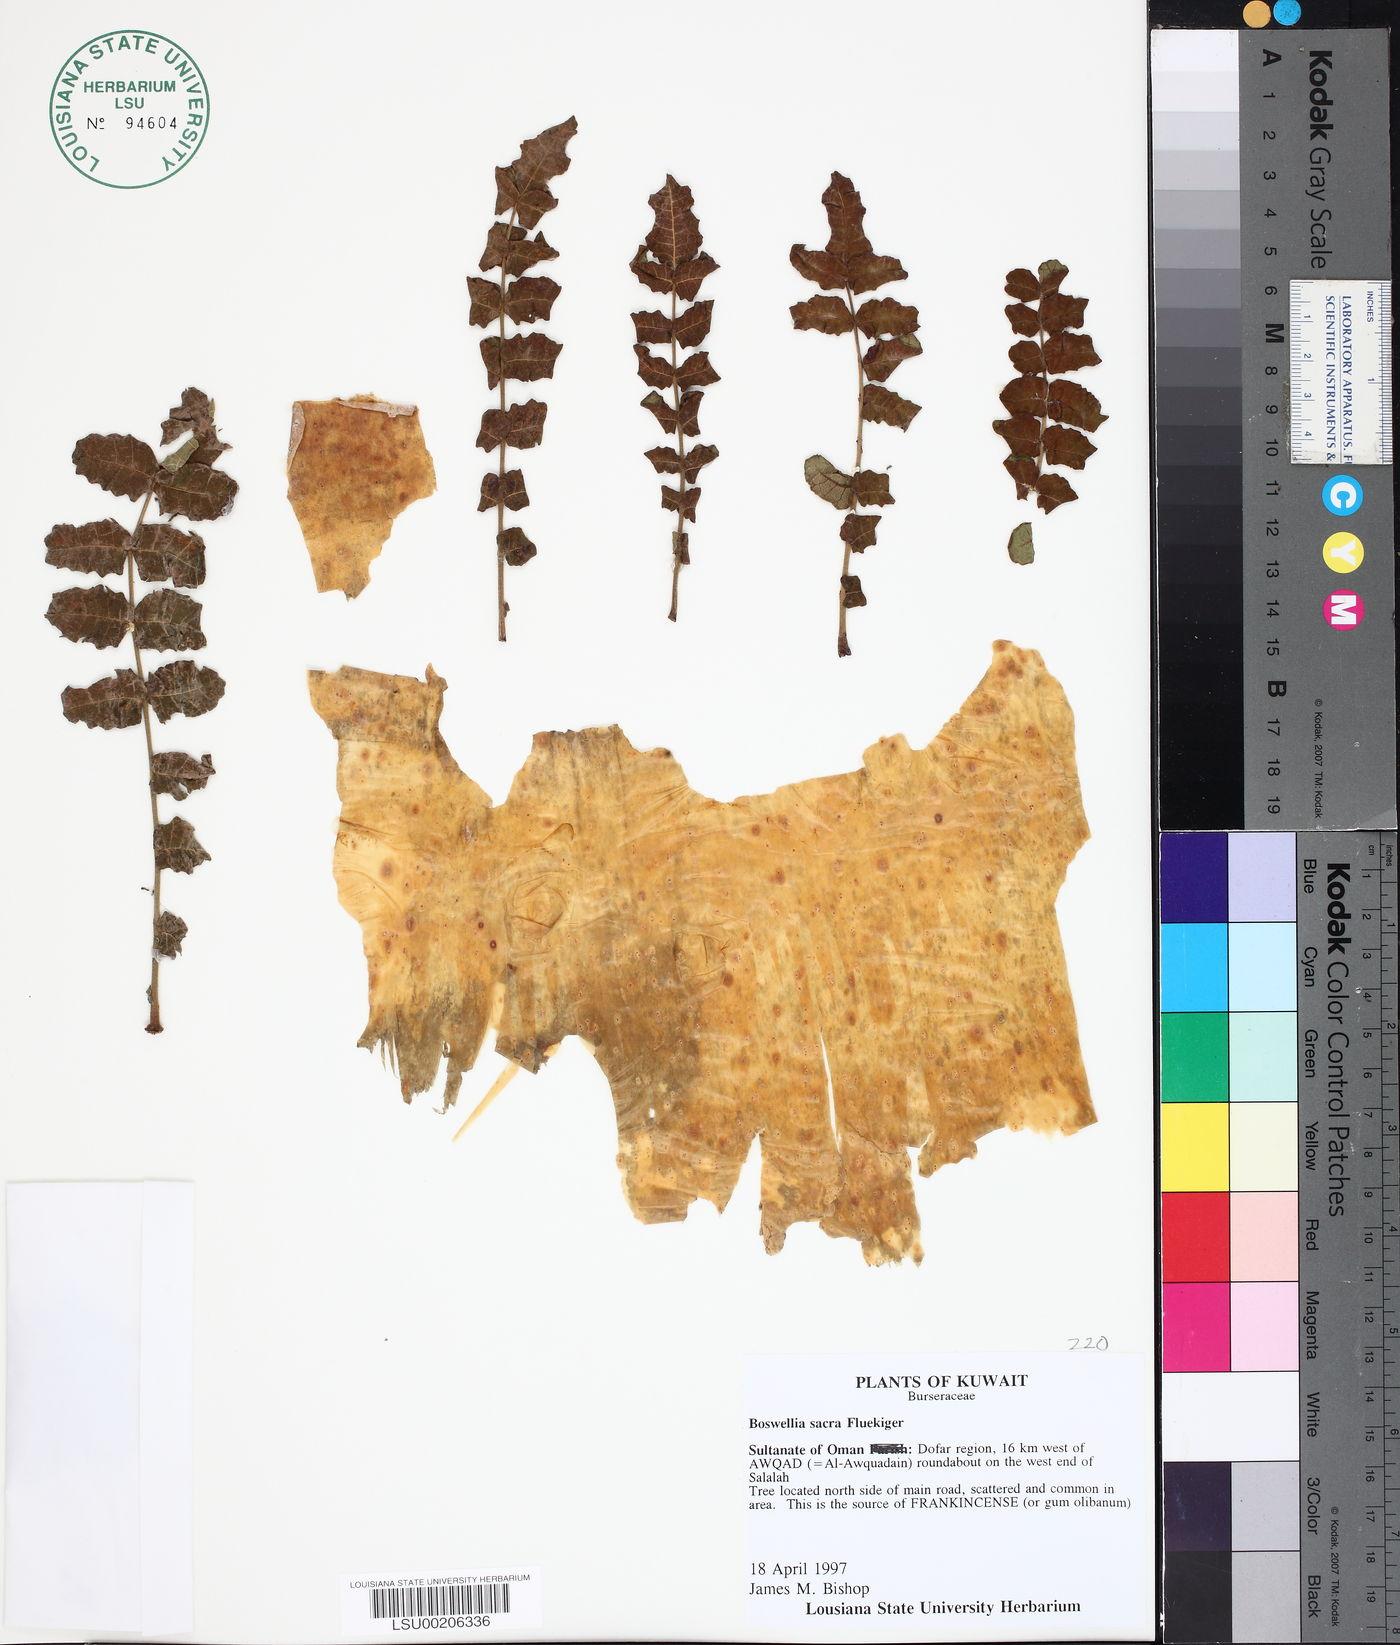 Boswellia image